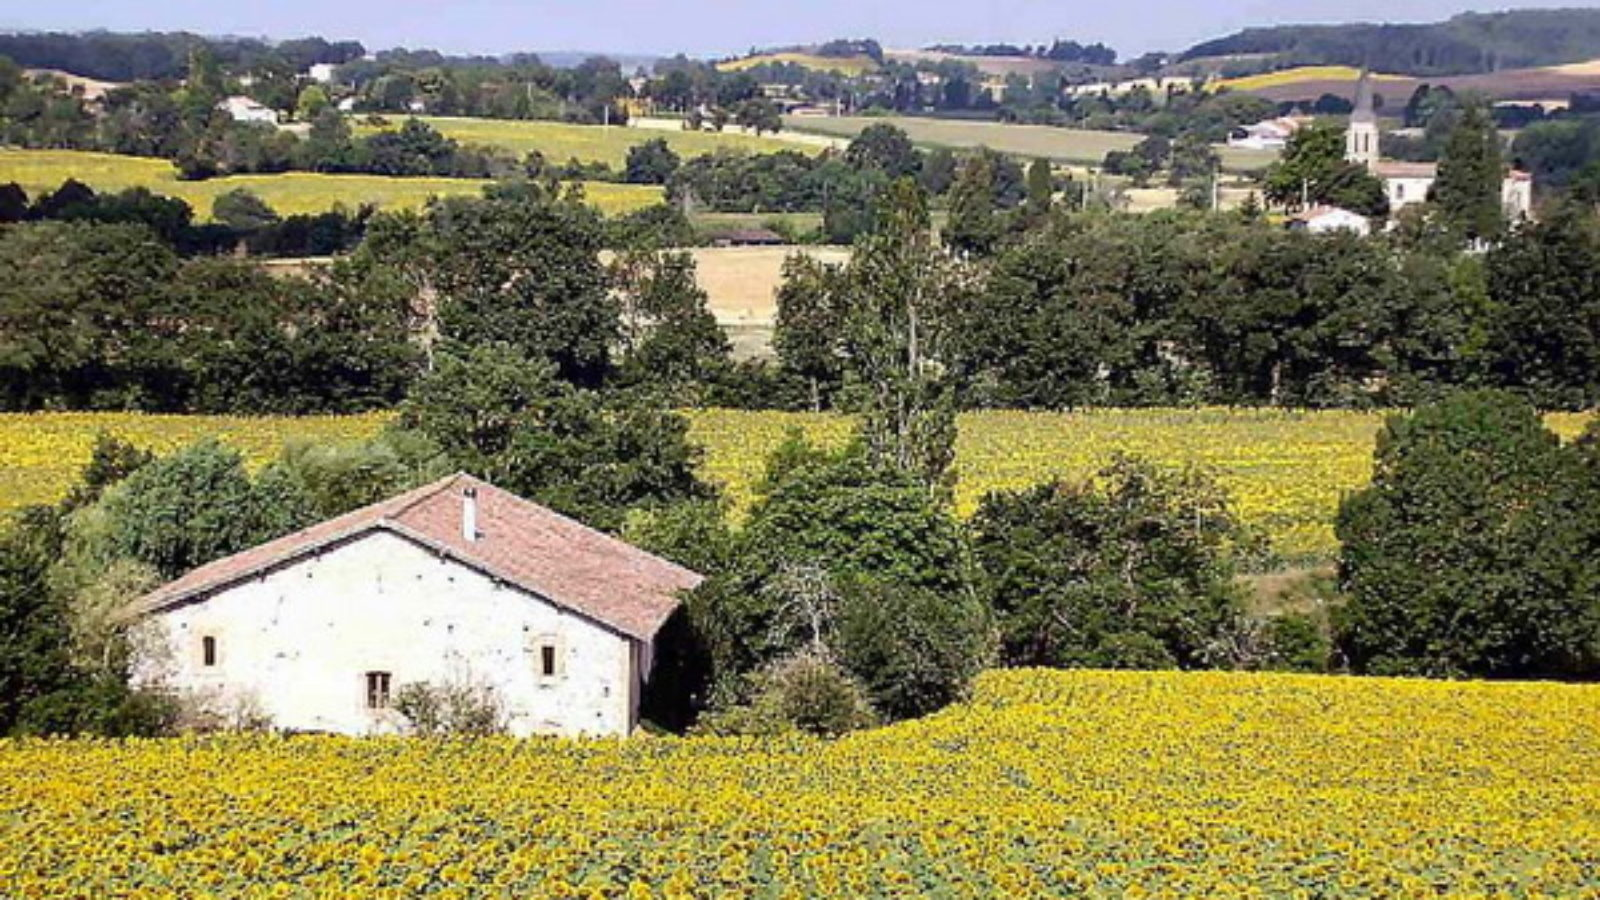 Gite Rural de La Grange, Gite de France Tarn